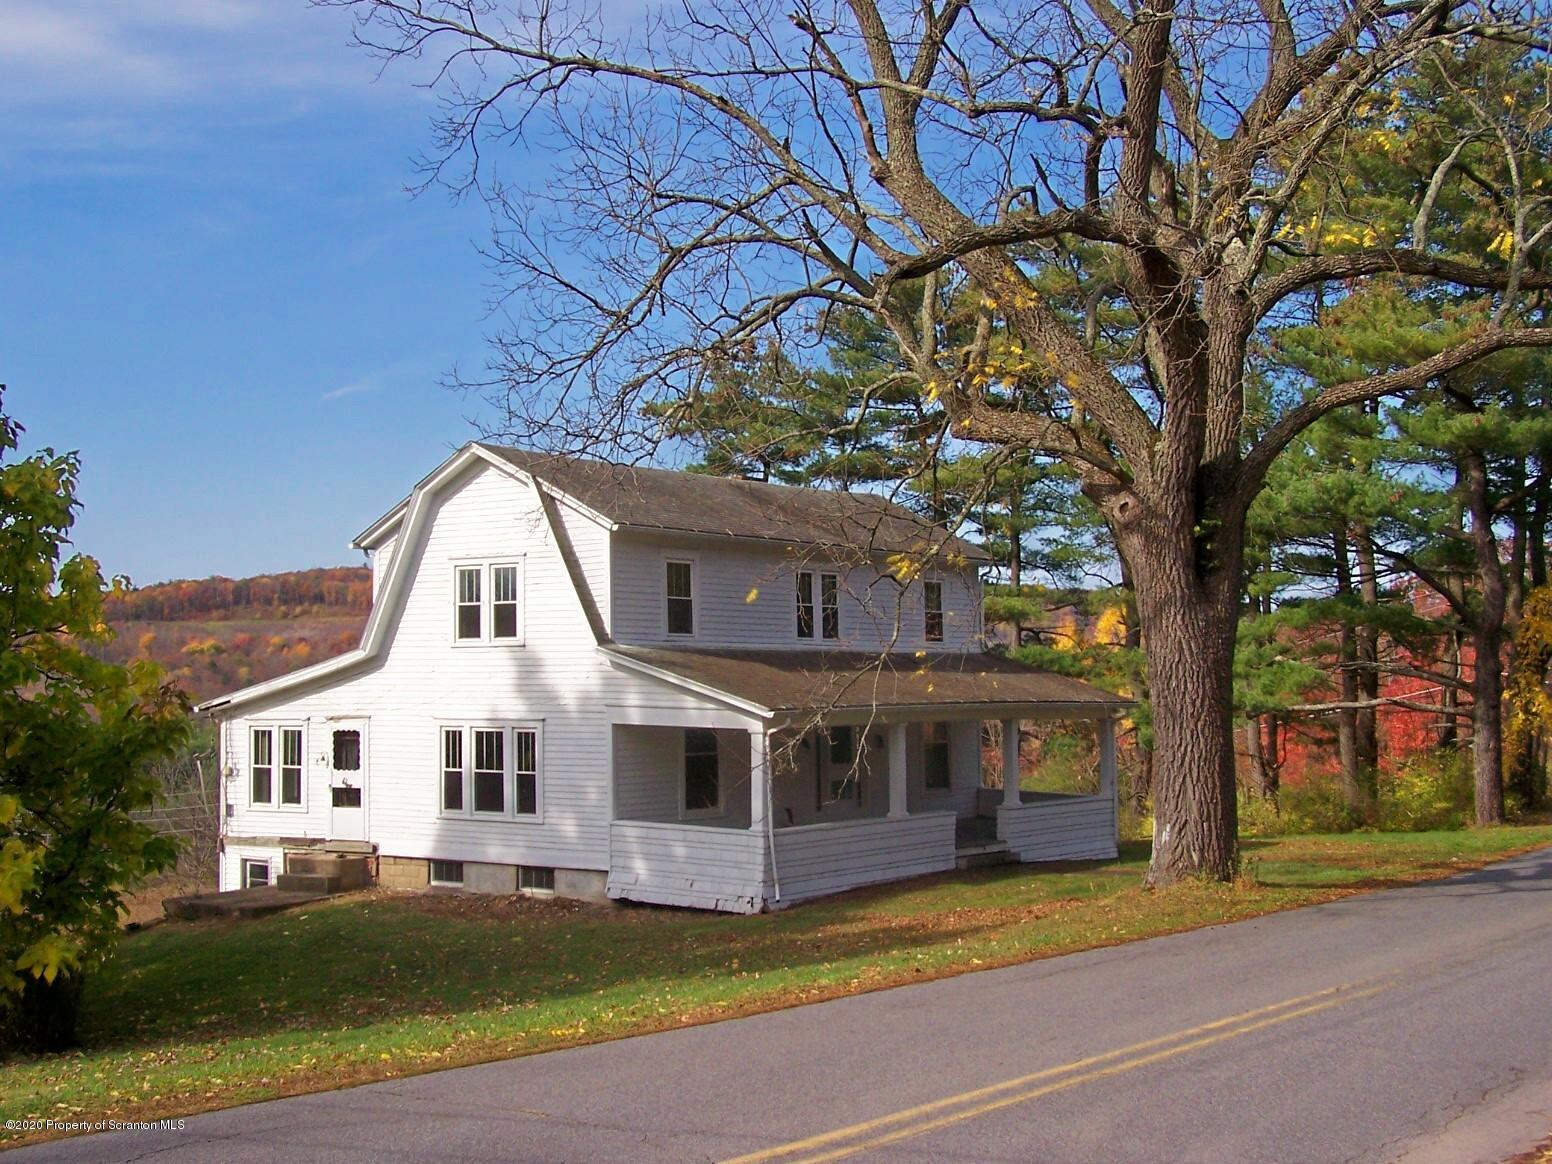 151 Dark Hollow Rd, Tunkhannock, Pennsylvania 18657, ,1.5 BathroomsBathrooms,Commercial,For Sale,Dark Hollow,20-4667